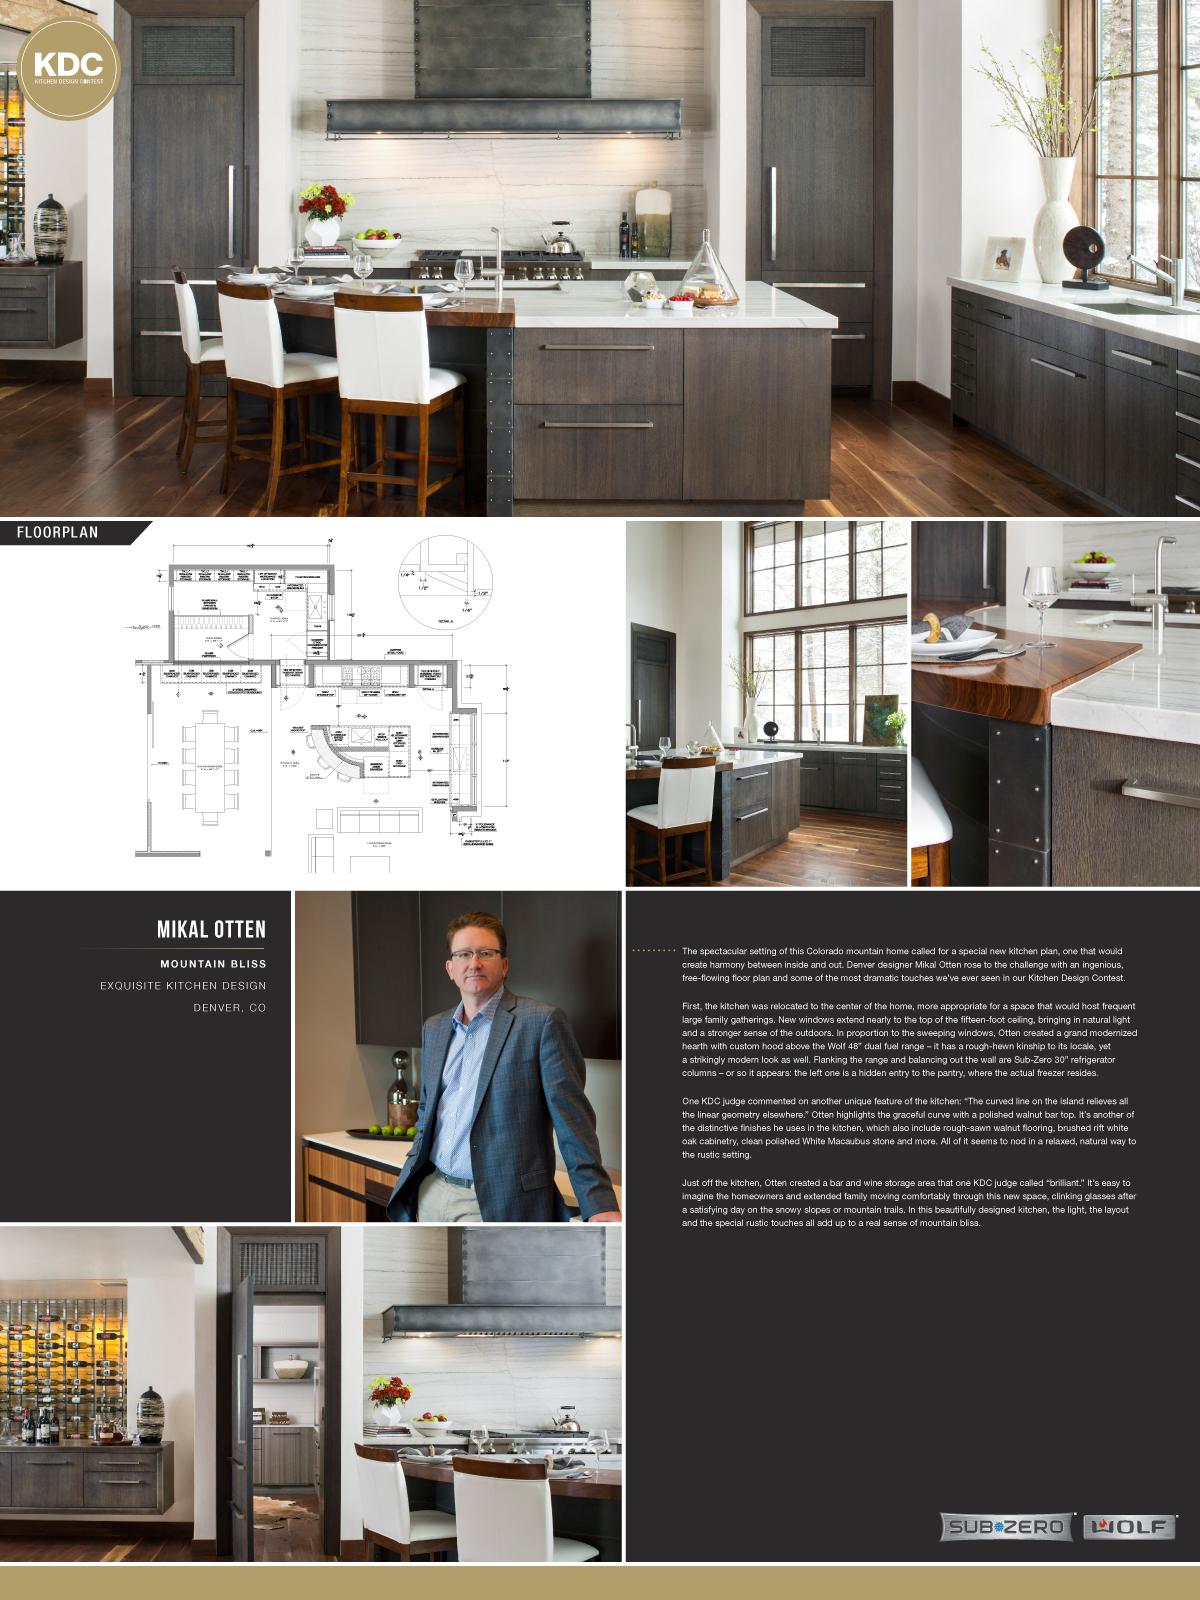 Sub-Zero & Wolf Kitchen Design Contest   Life of an Architect